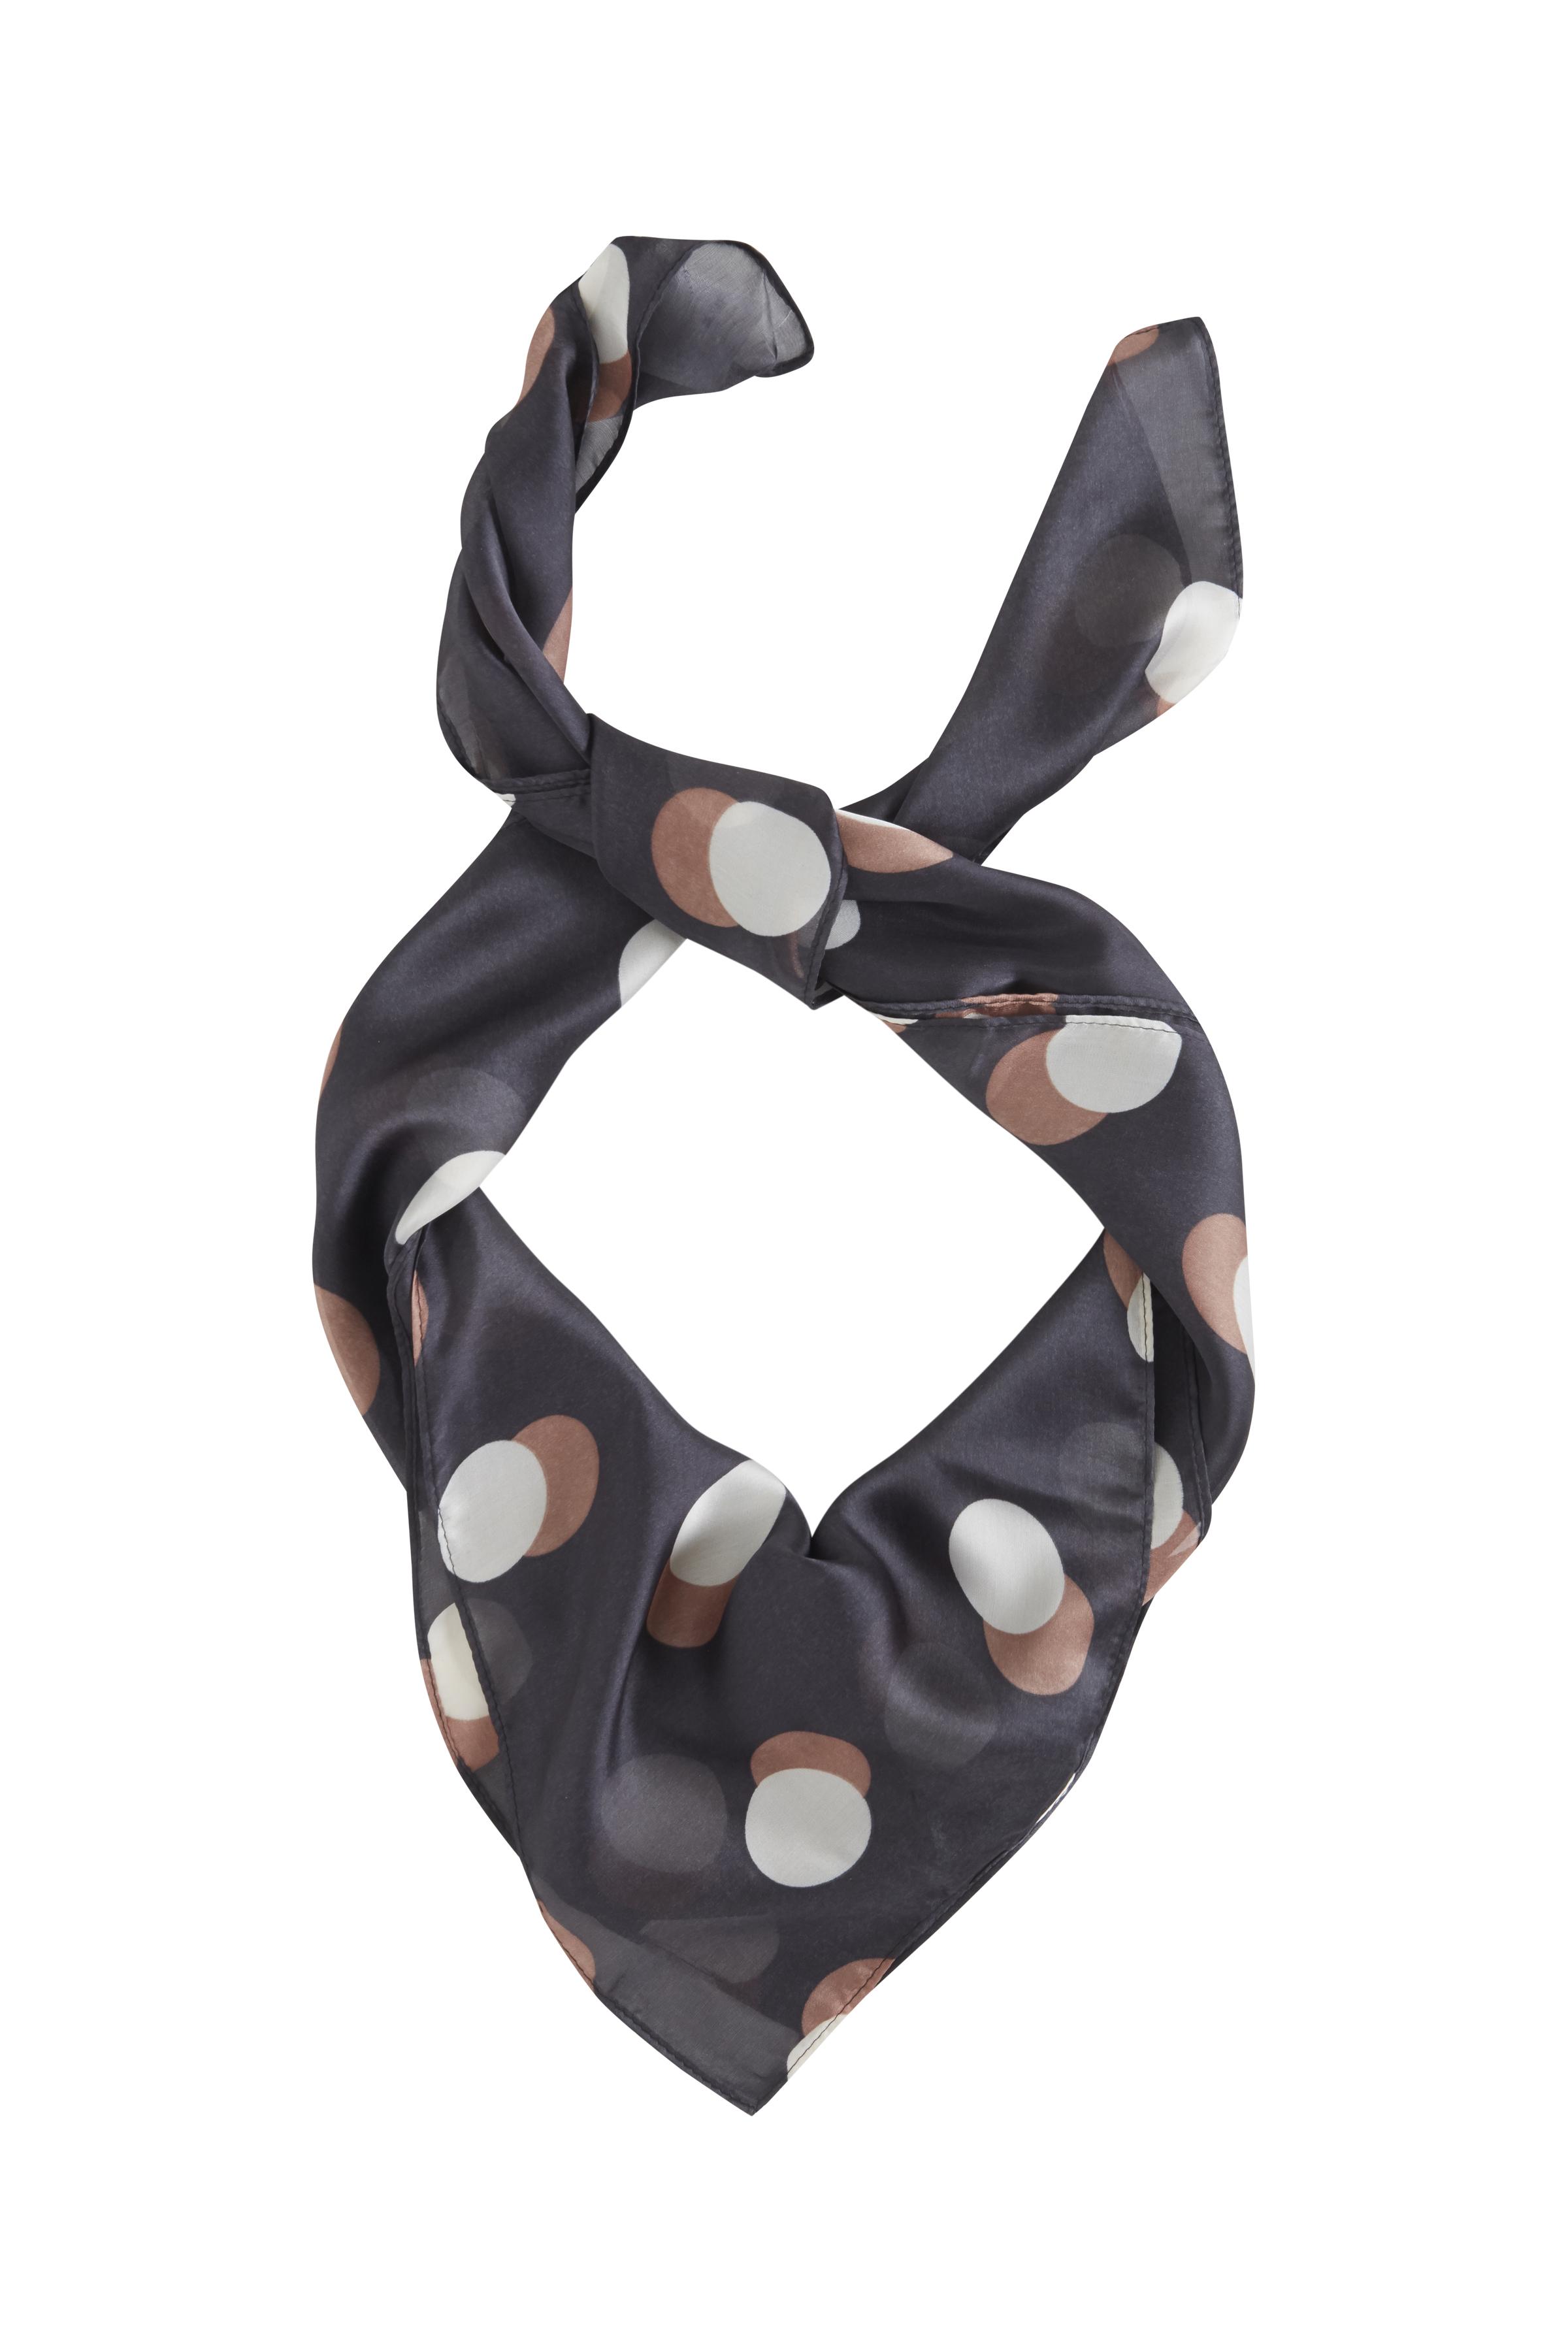 Dark Navy Tørklæde – Køb Dark Navy Tørklæde fra str. ONE her